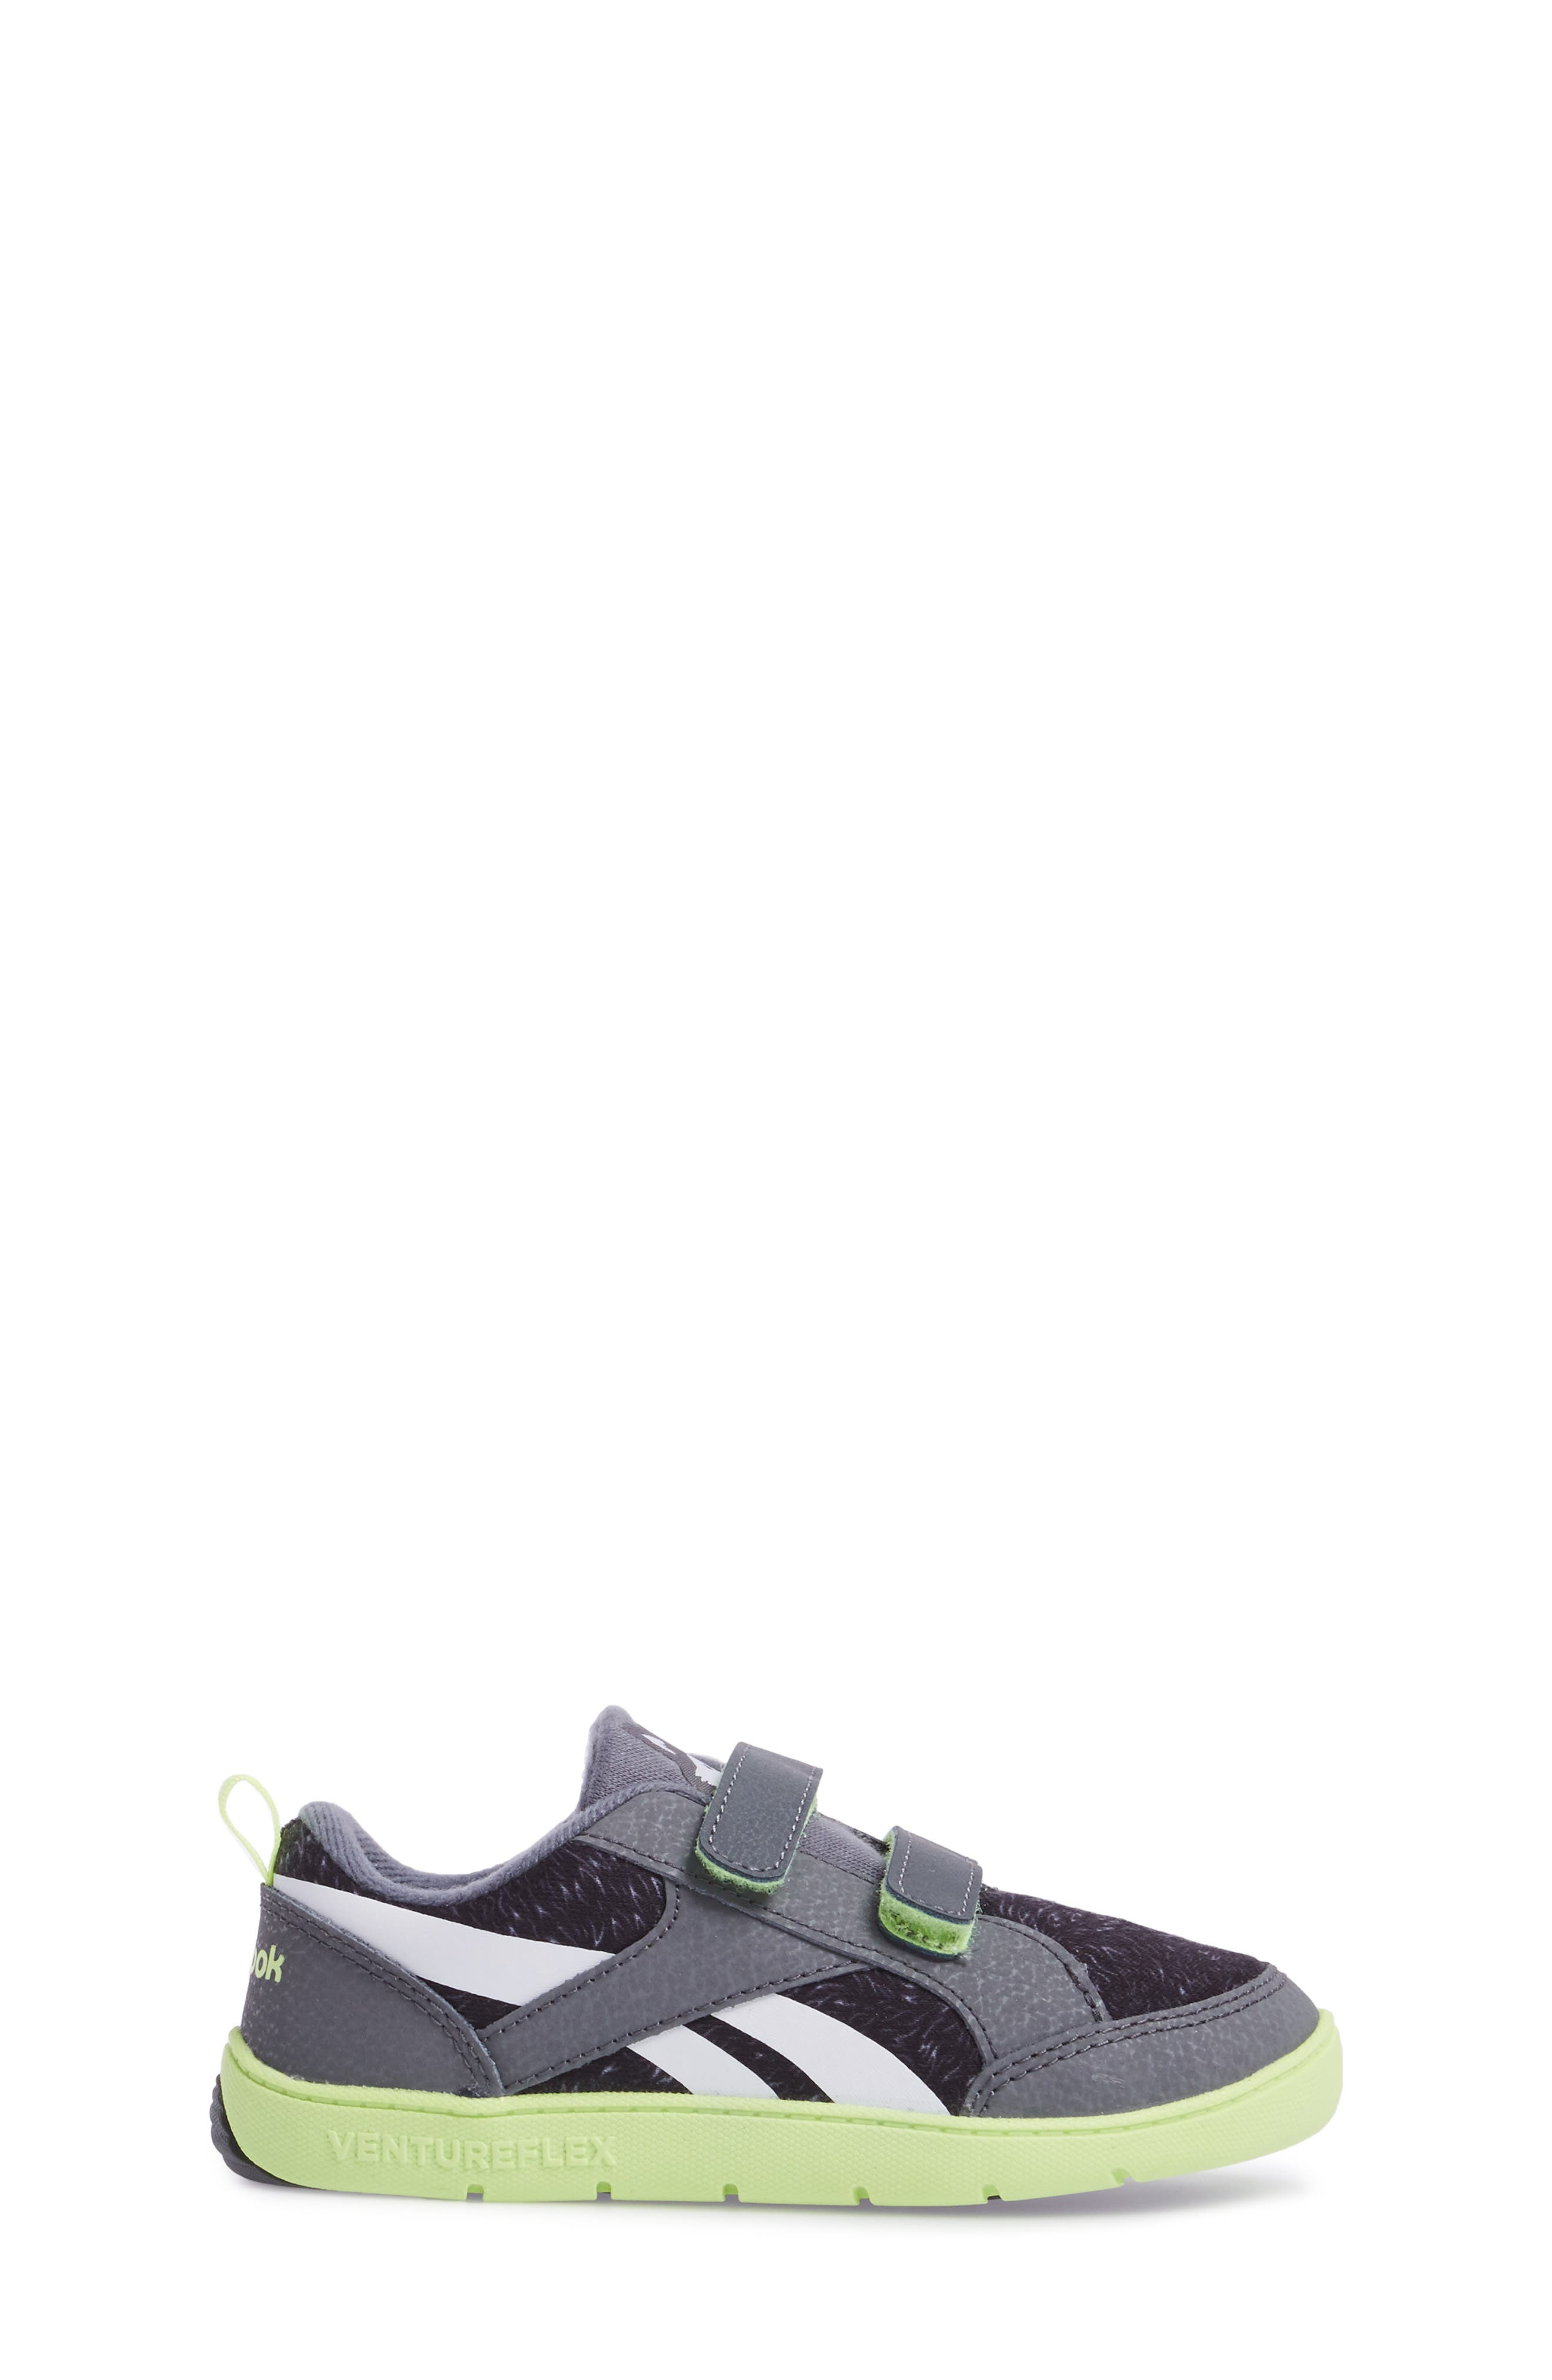 Alternate Image 3  - Reebok Ventureflex Critter Feet Sneaker (Baby, Walker & Toddler)